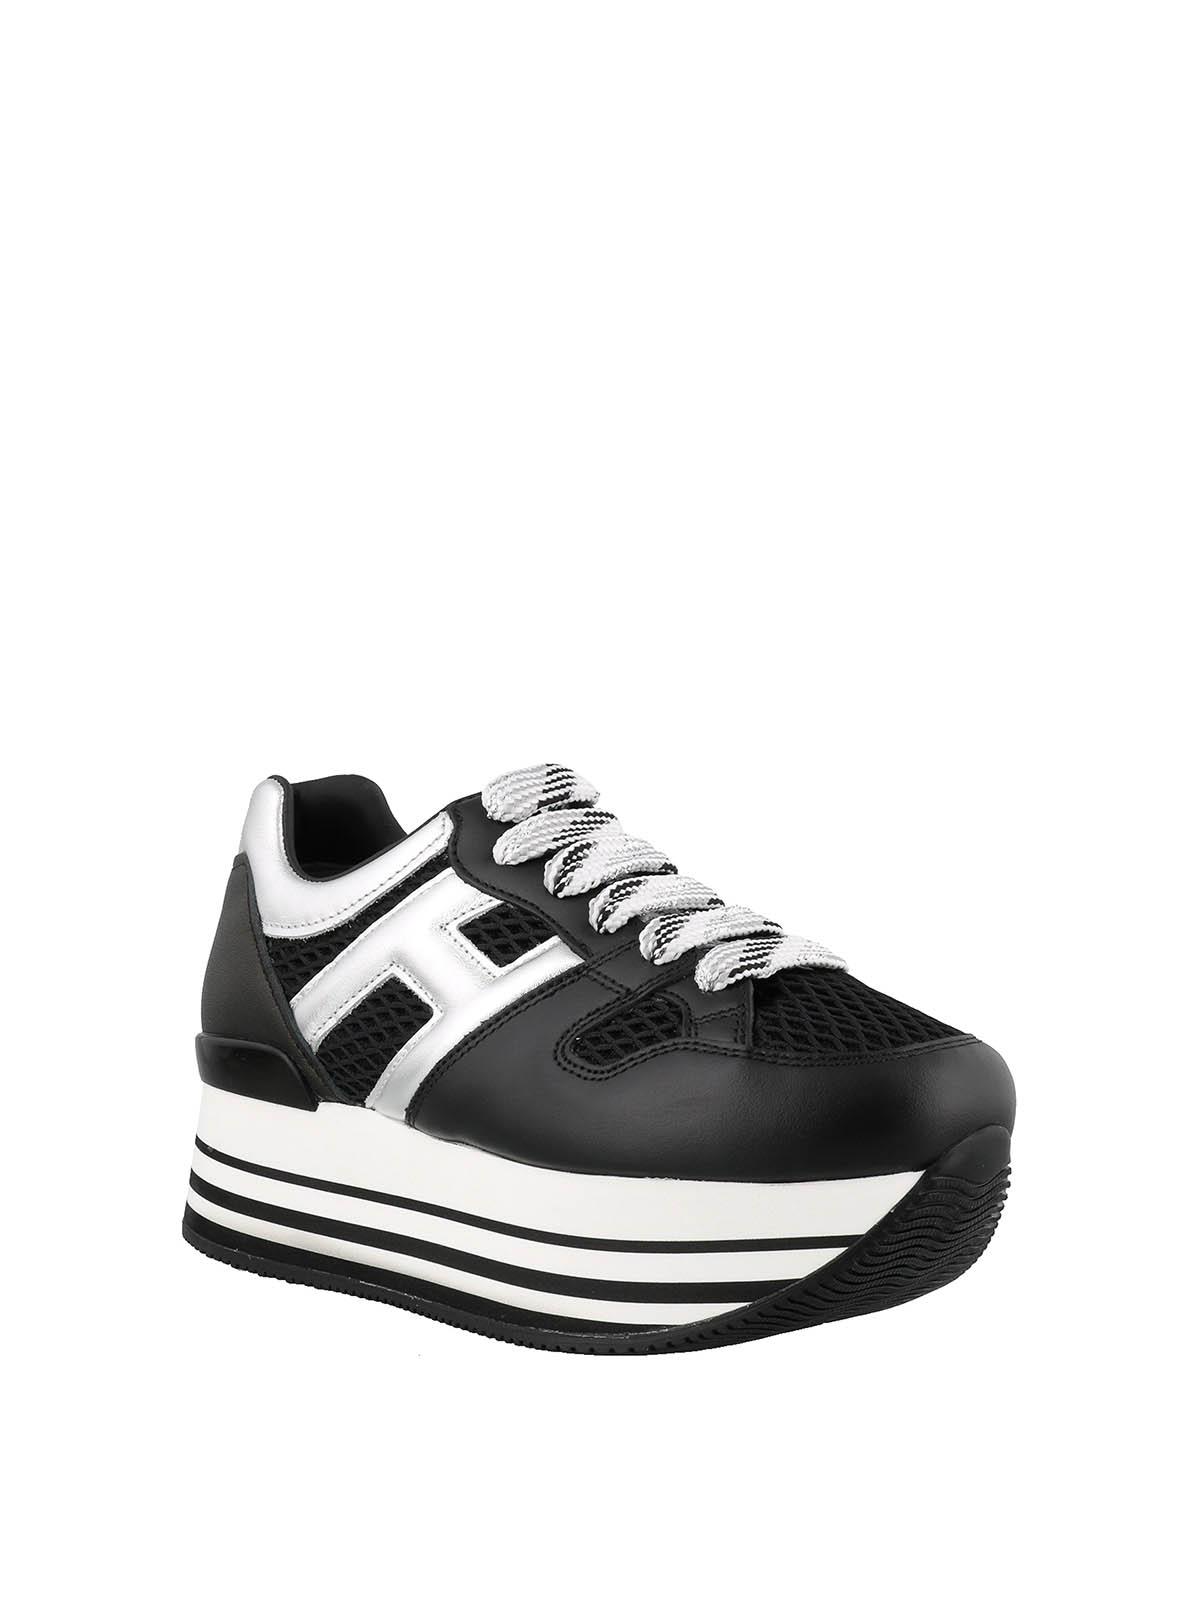 Sneakers Hogan - Sneaker Maxi H222 in pelle e tessuto ...